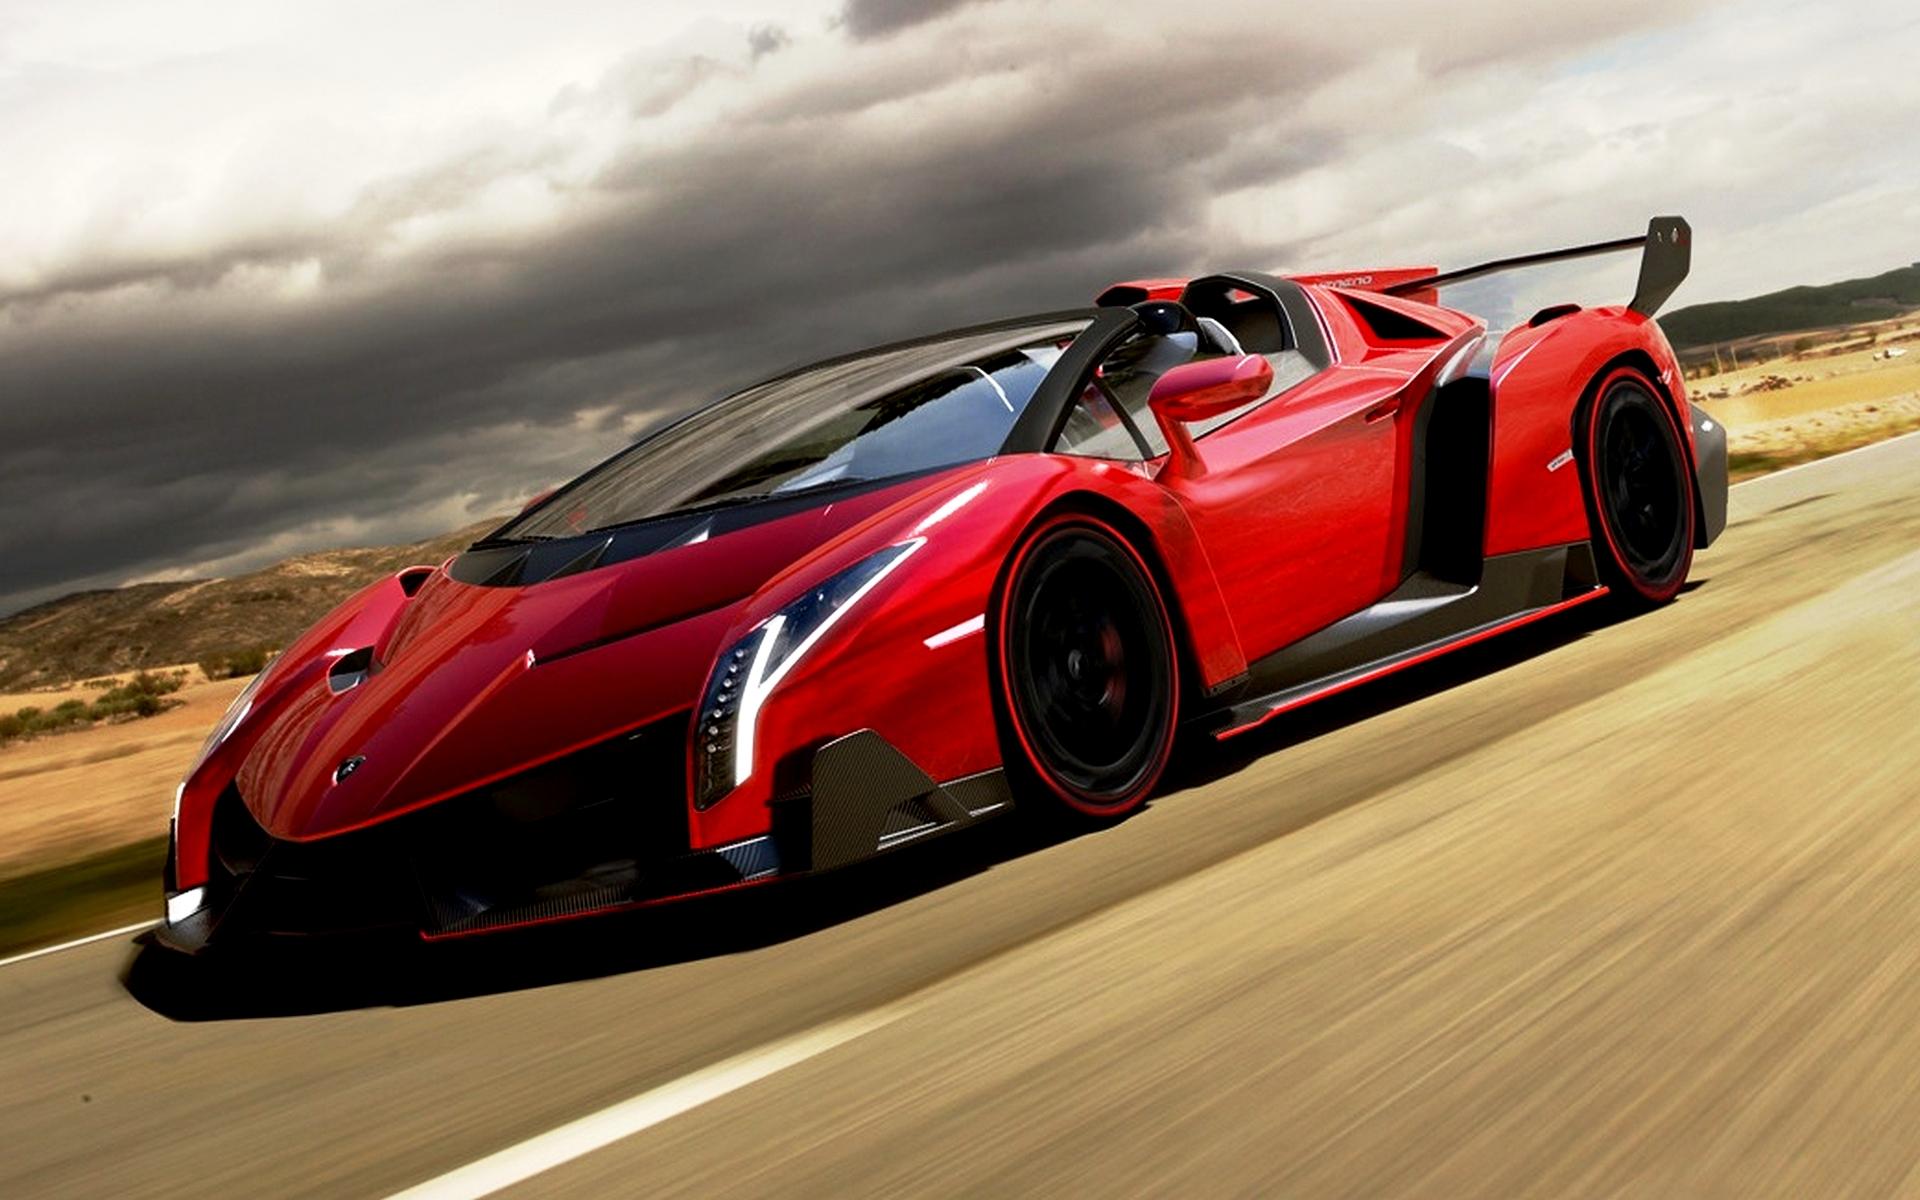 Lamborghini The Most Beautiful Car In The World 1920x1200